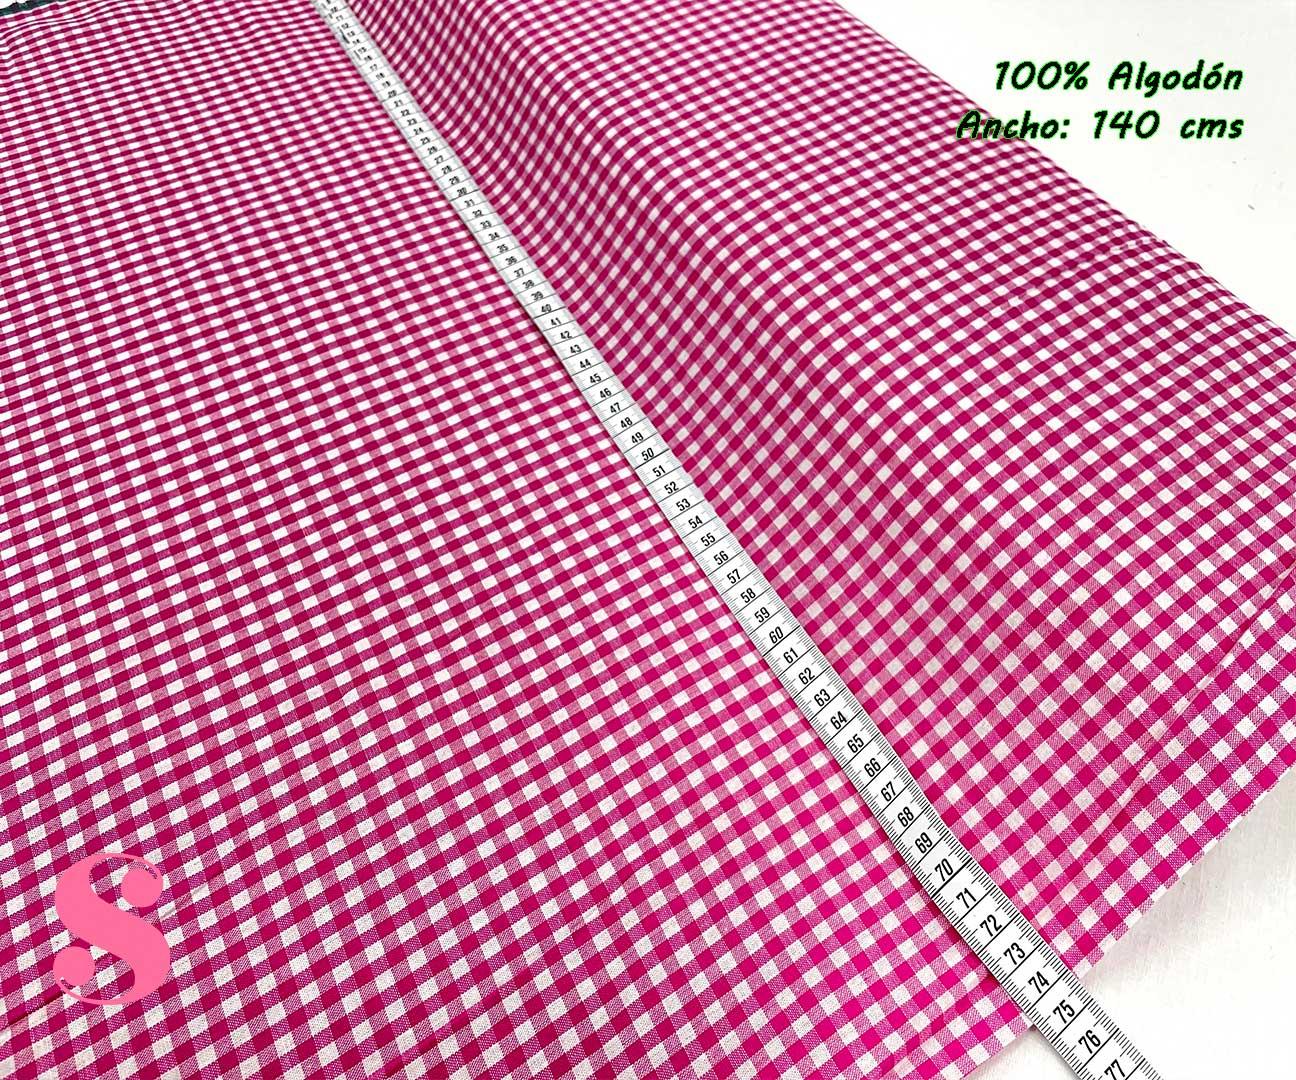 34-telas-de-algodón-100%,telas-infantiles,estampados-infantiles,telas-para-bebes,Vicky Algodón Cuadros Fucsia 5 Milímetros